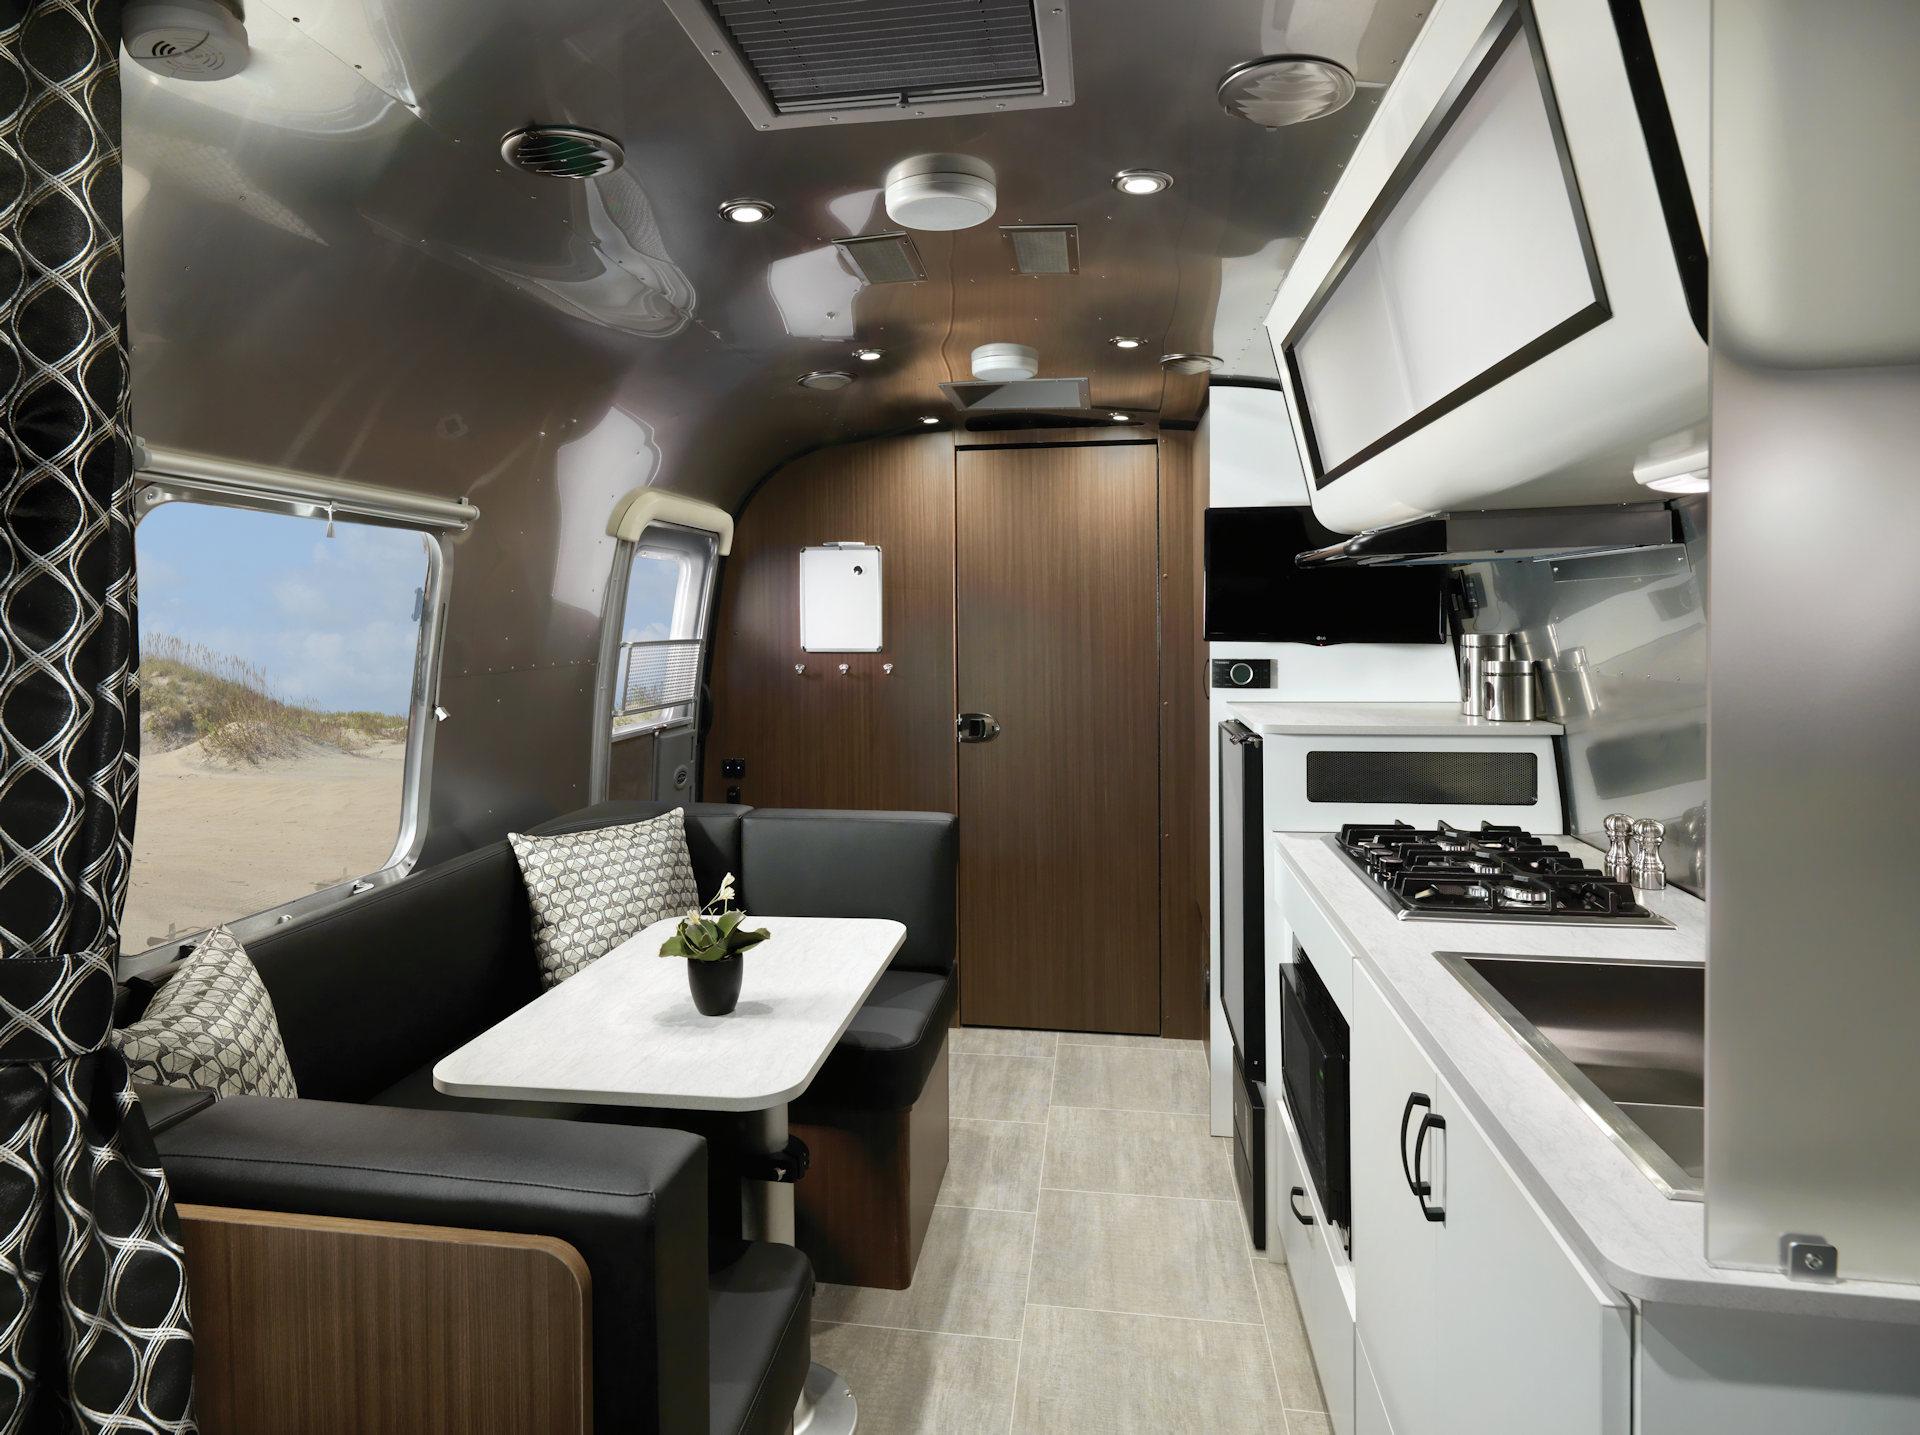 Airstream Germany